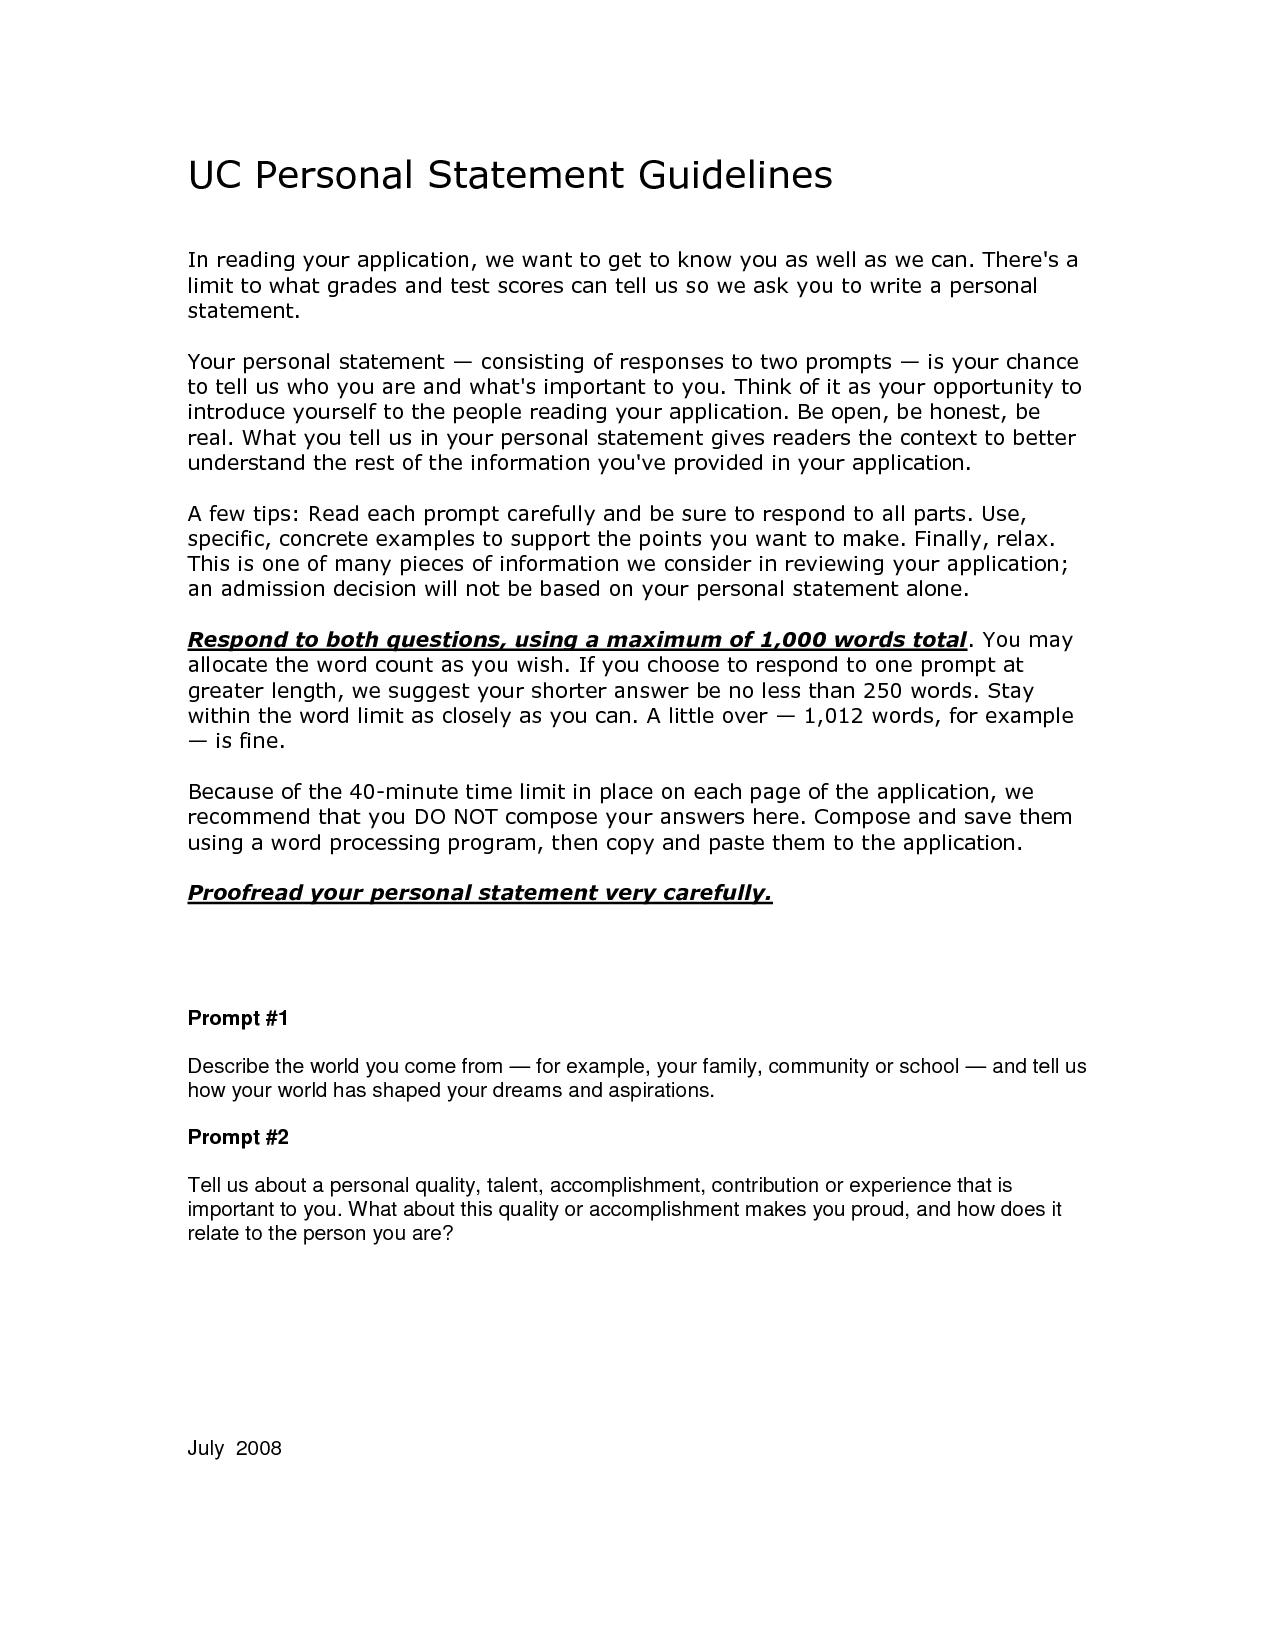 Community service essay scholarship